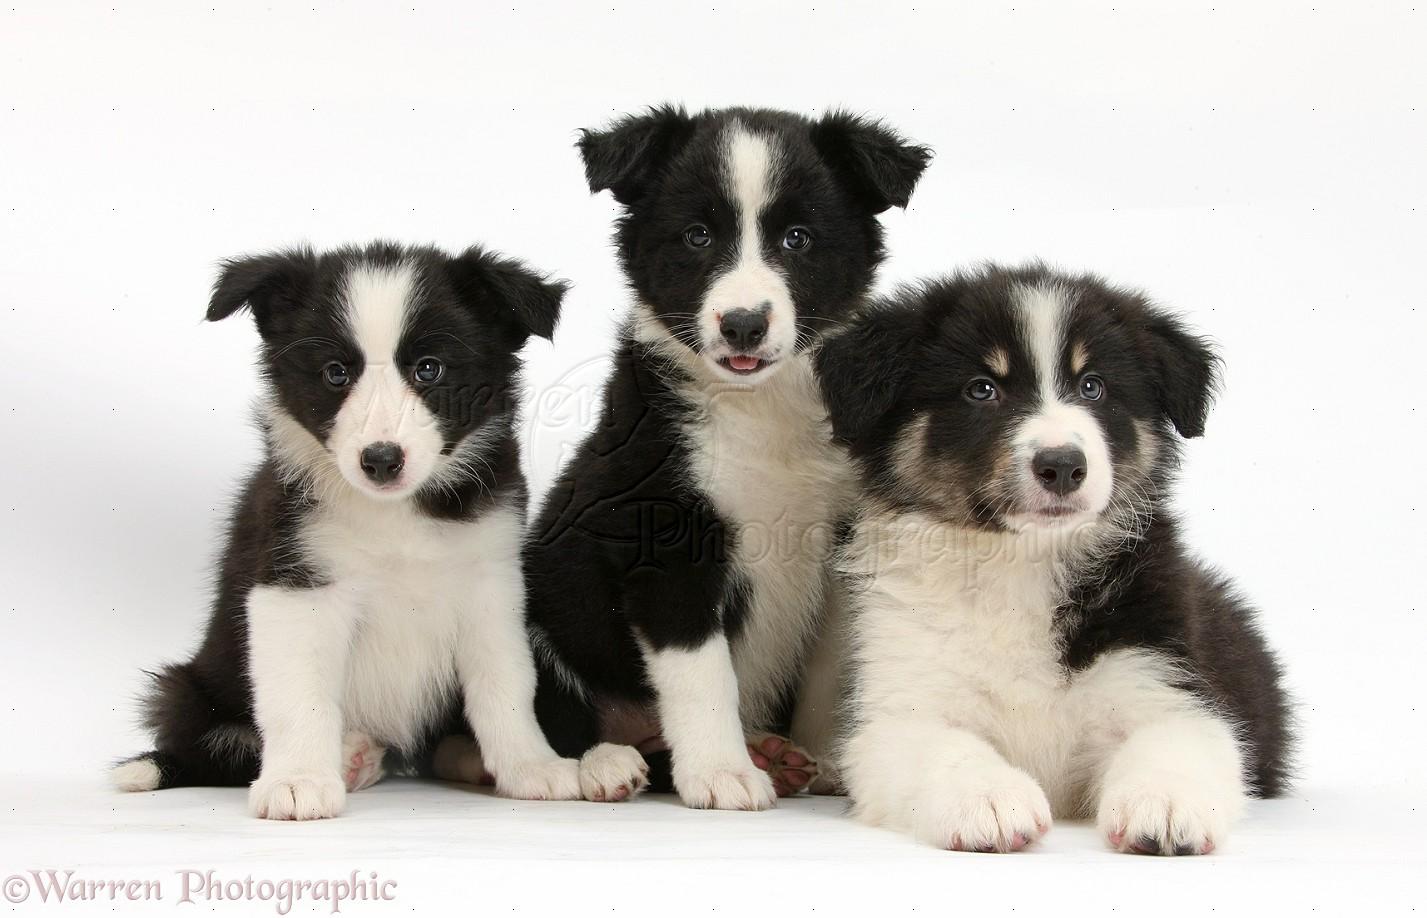 Wp36296 three black and white border collie pups